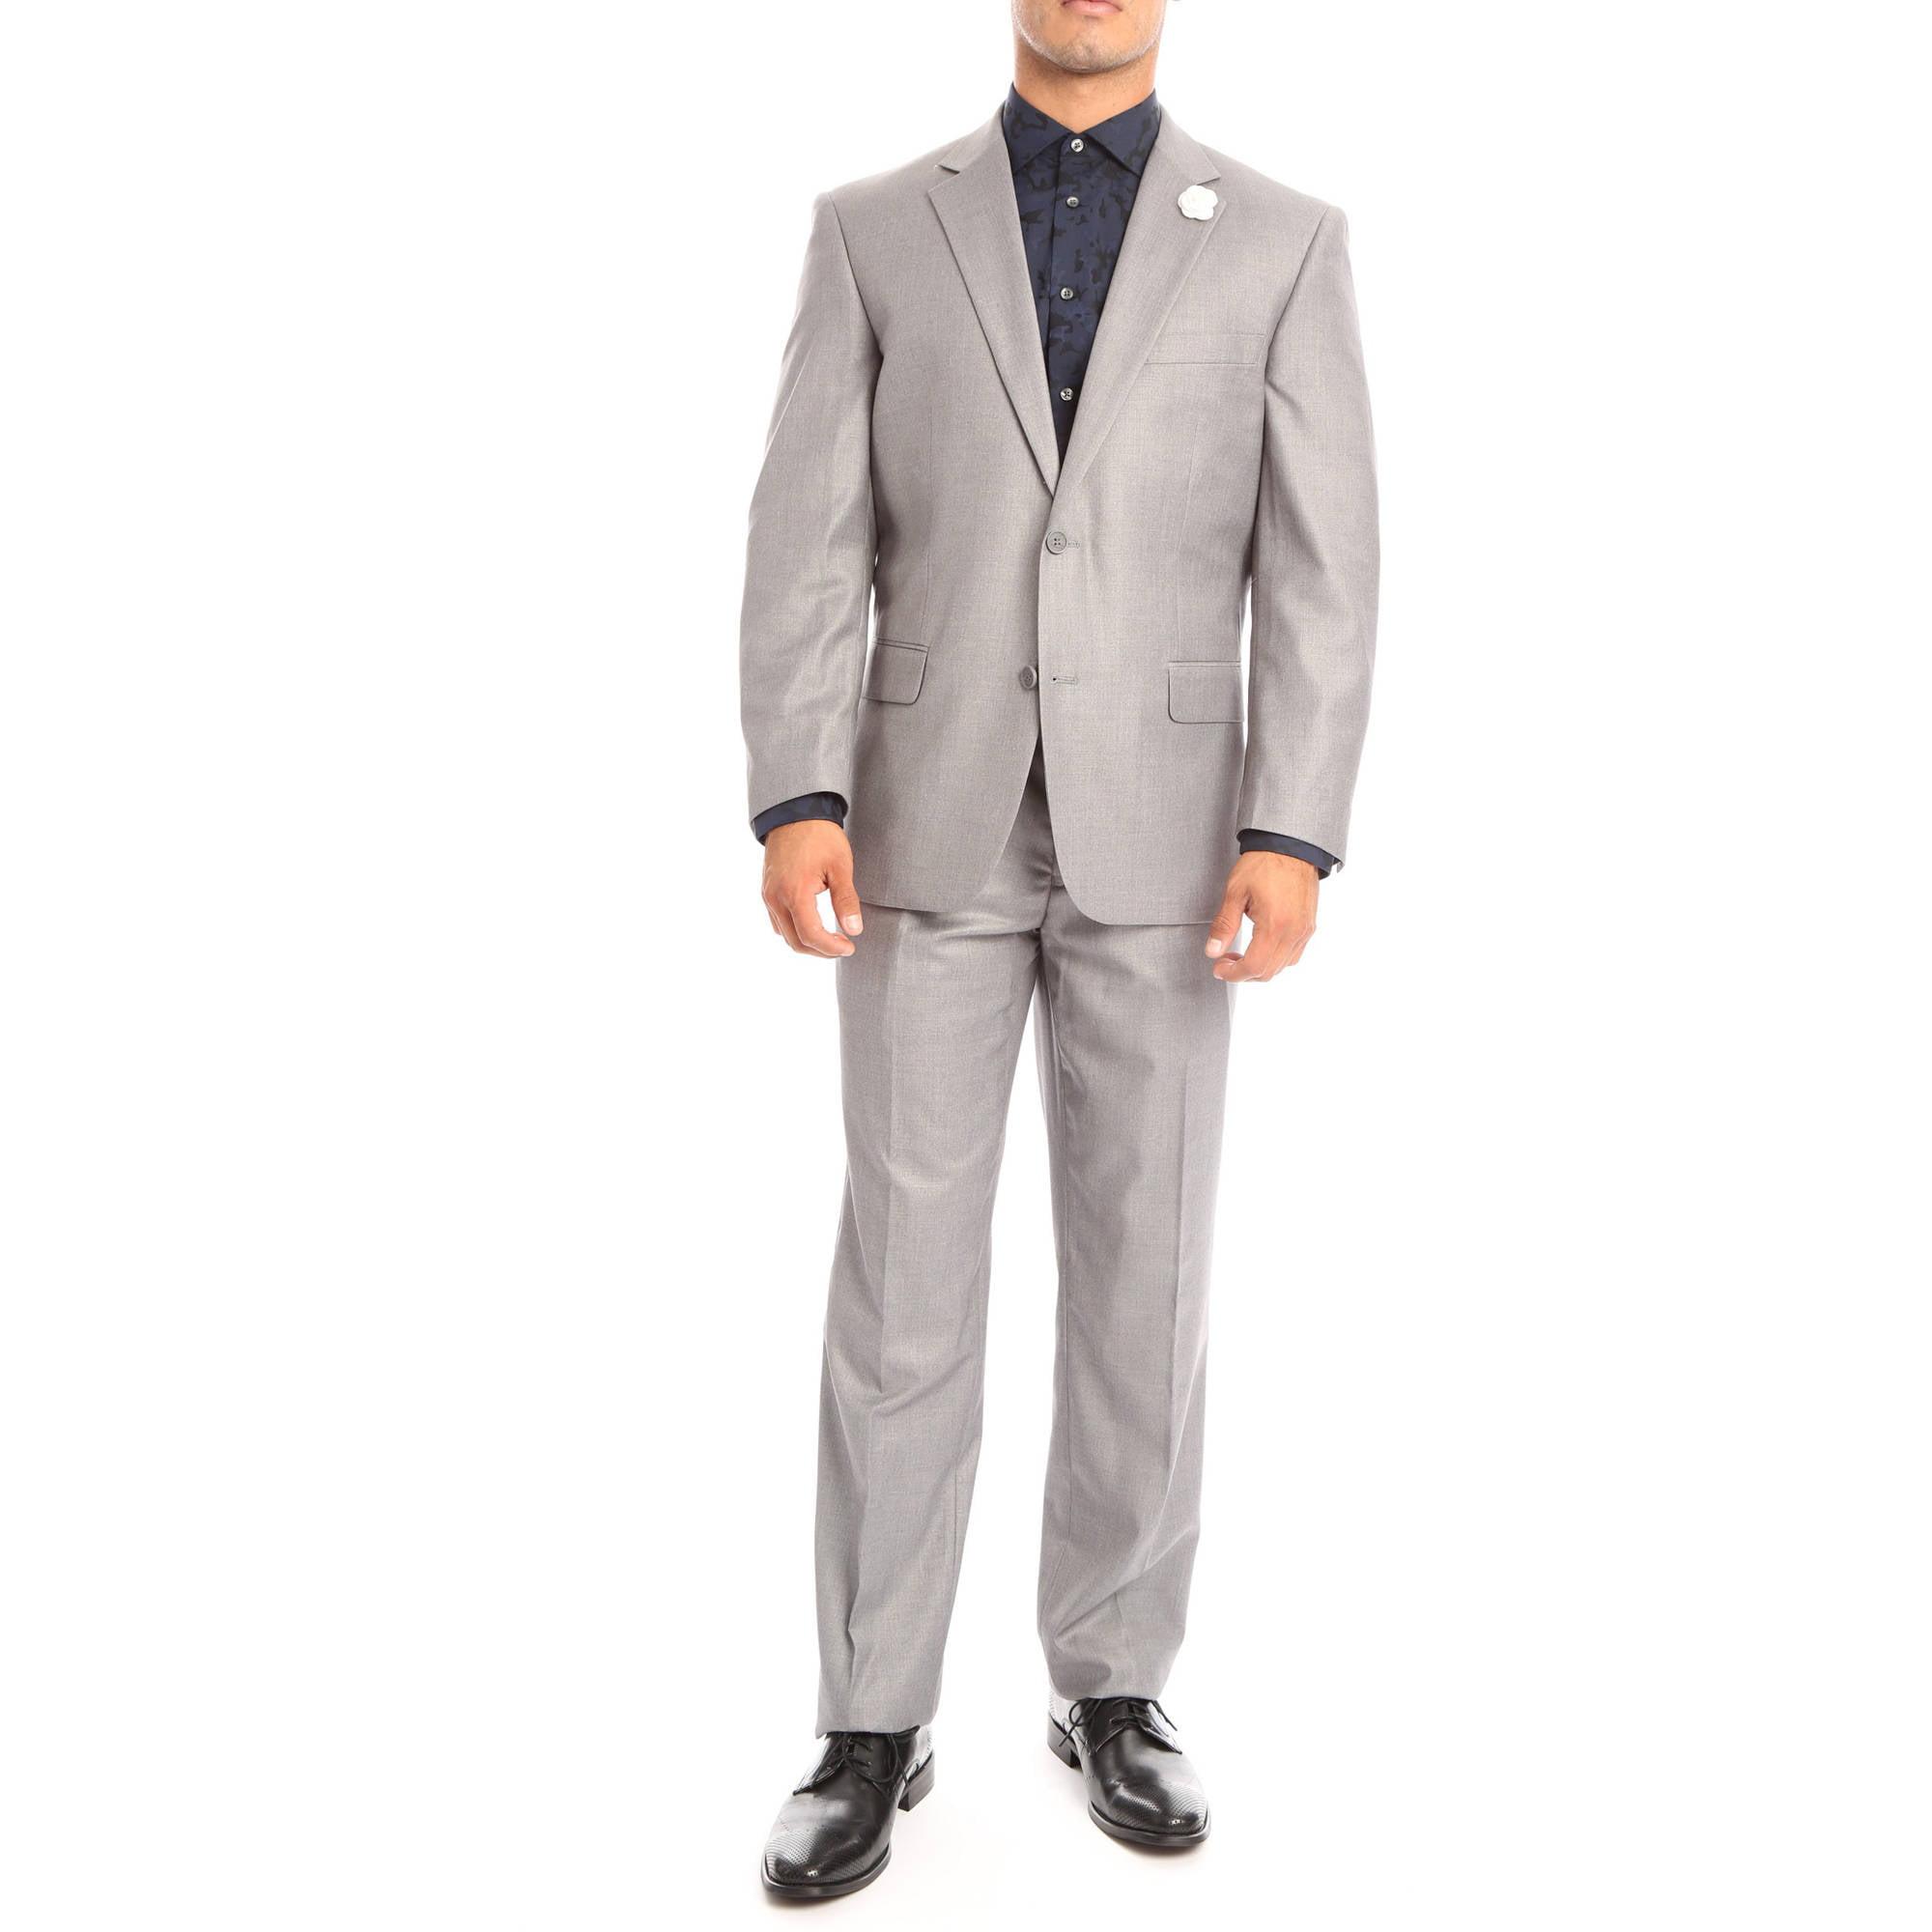 Verno Bellomi Men's Light Grey Slim Fit Italian Styled Two Piece Suit